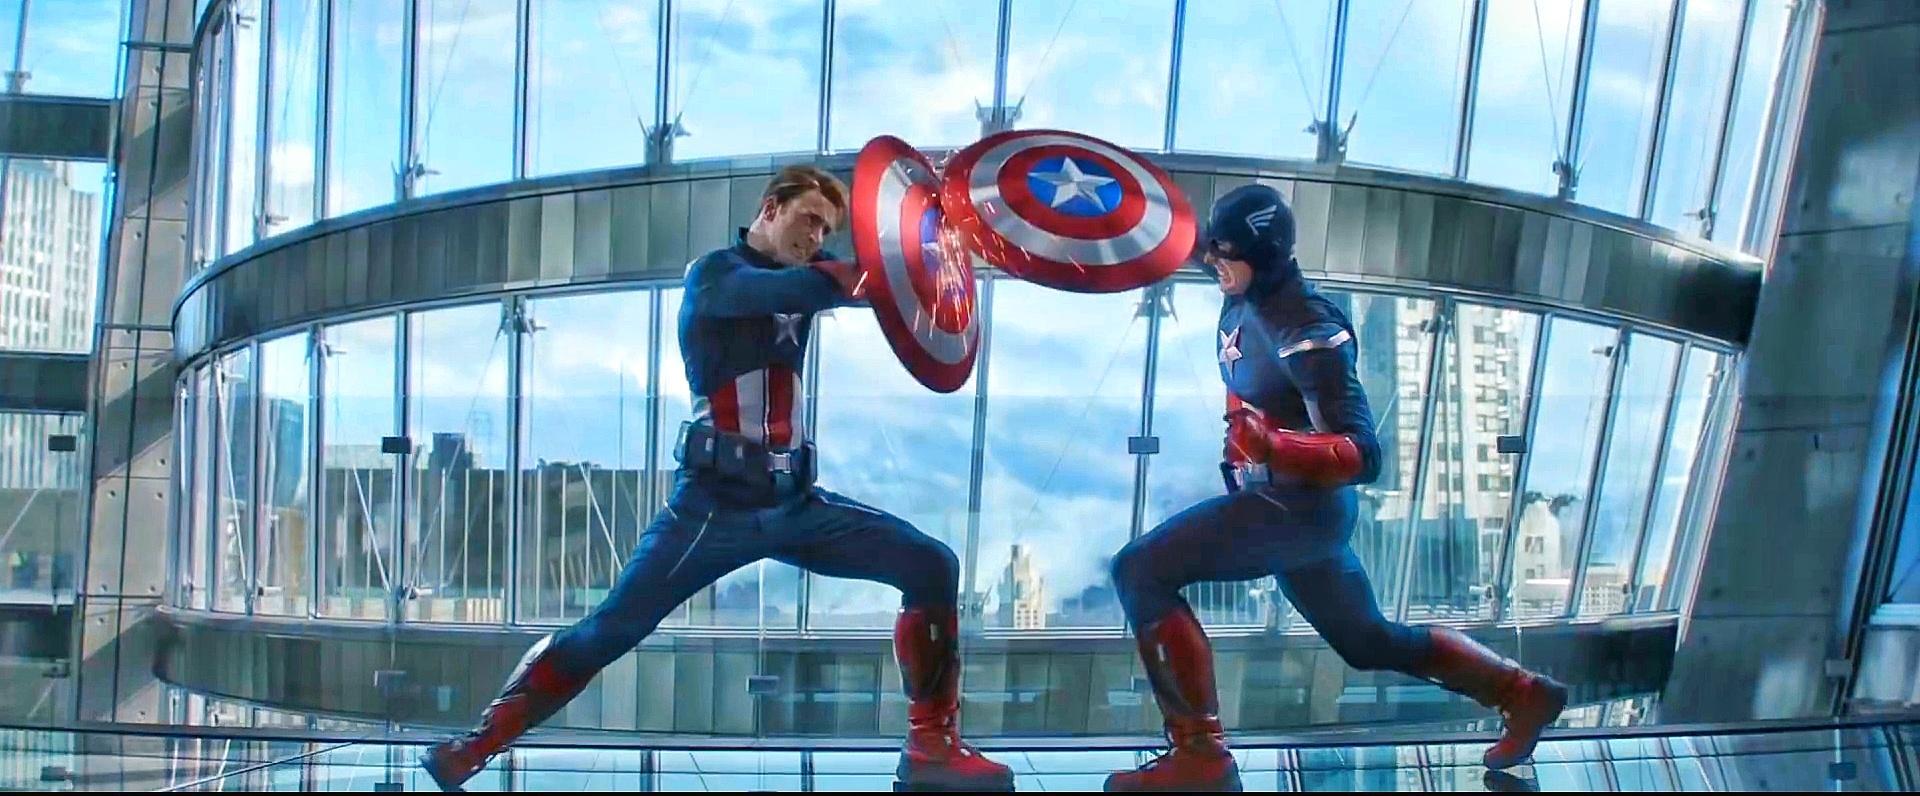 captain america marvel marketing entertainment